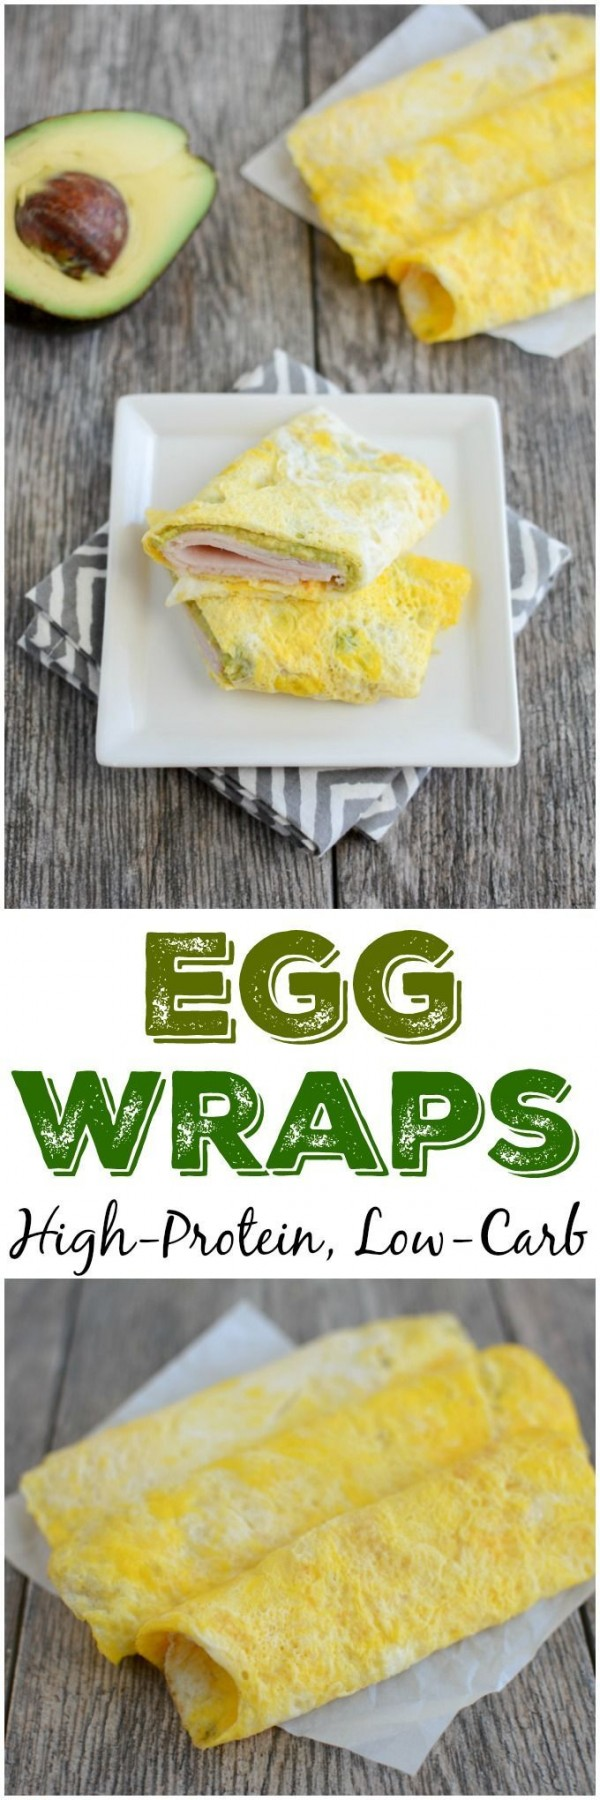 Check out this recipe for breakfast egg wraps. Yummy! #RecipeIdeas @recipes_to_go